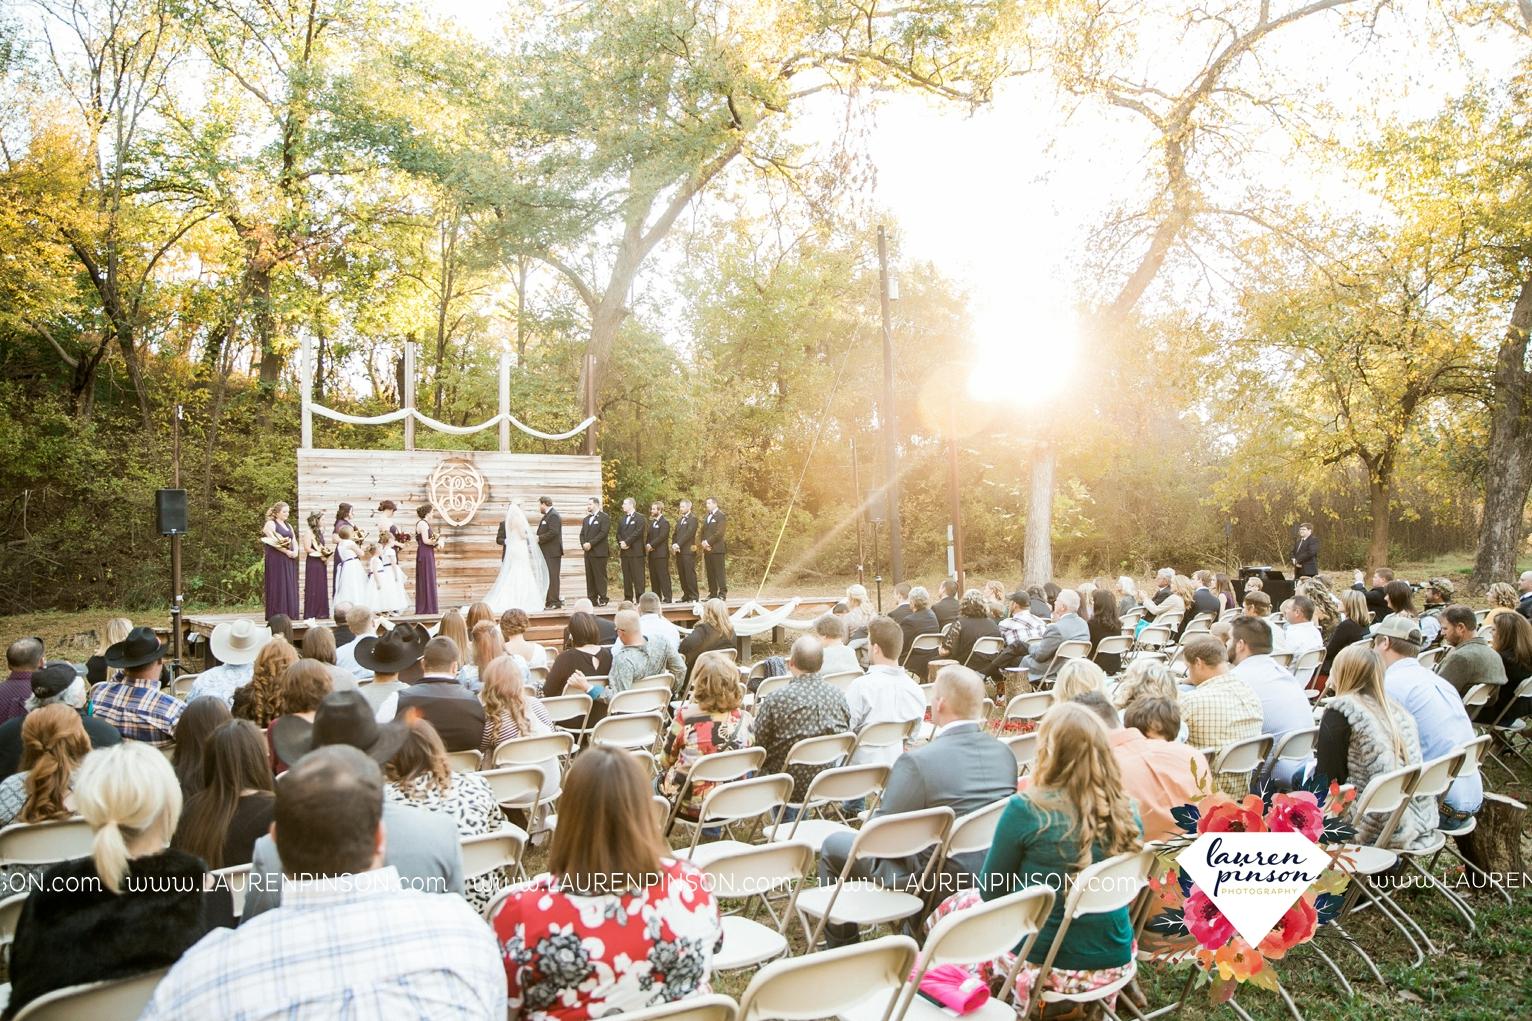 rustic-wichita-falls-texas-wedding-photographer-gold-glam-mayfield-events-market-street-united-allue-bridals-fall_1686.jpg